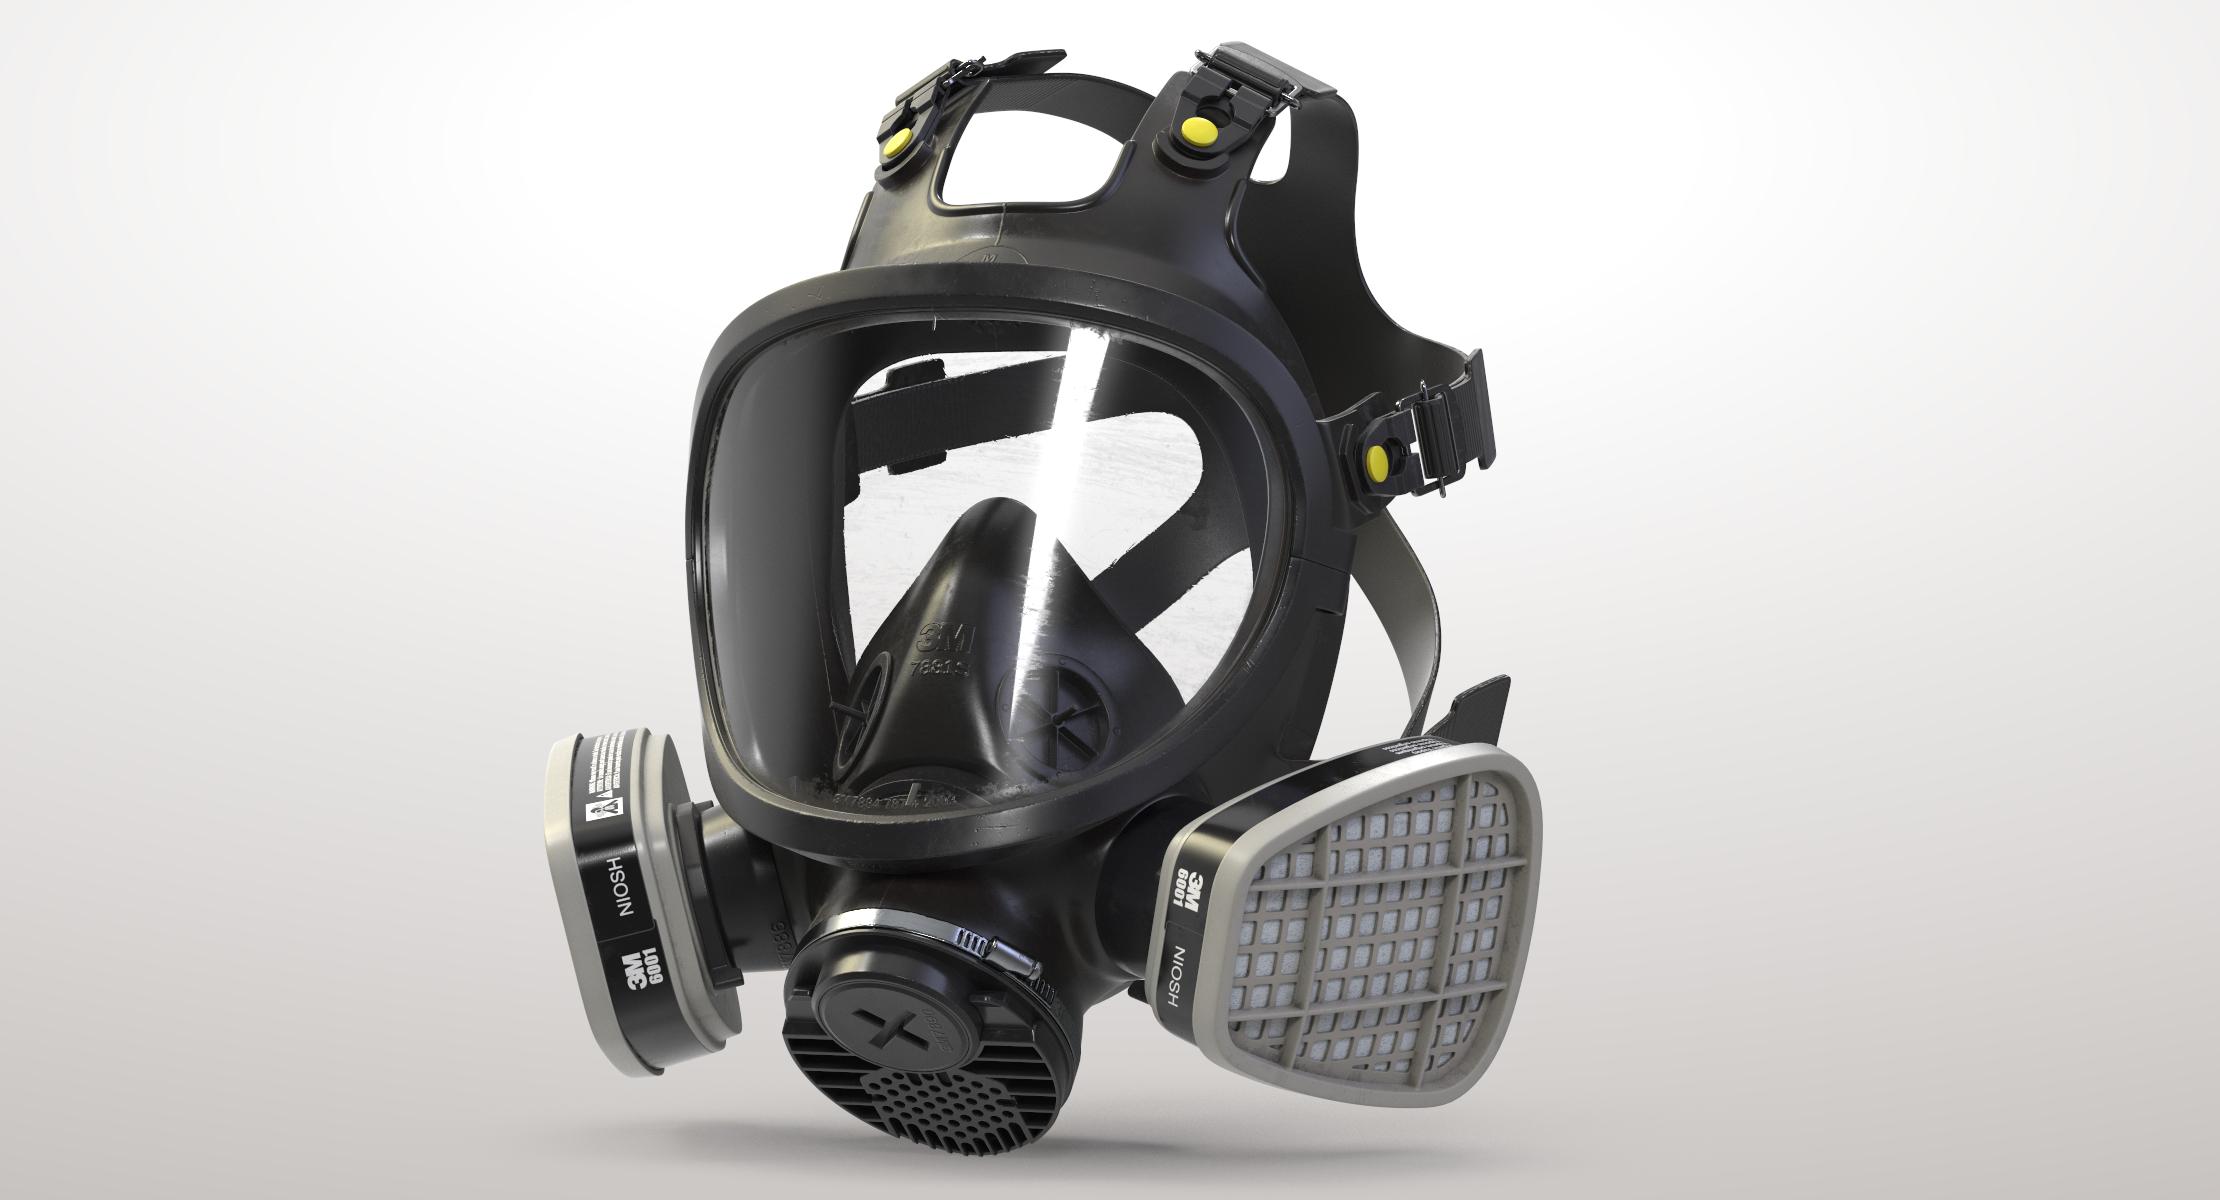 3m biohazard mask